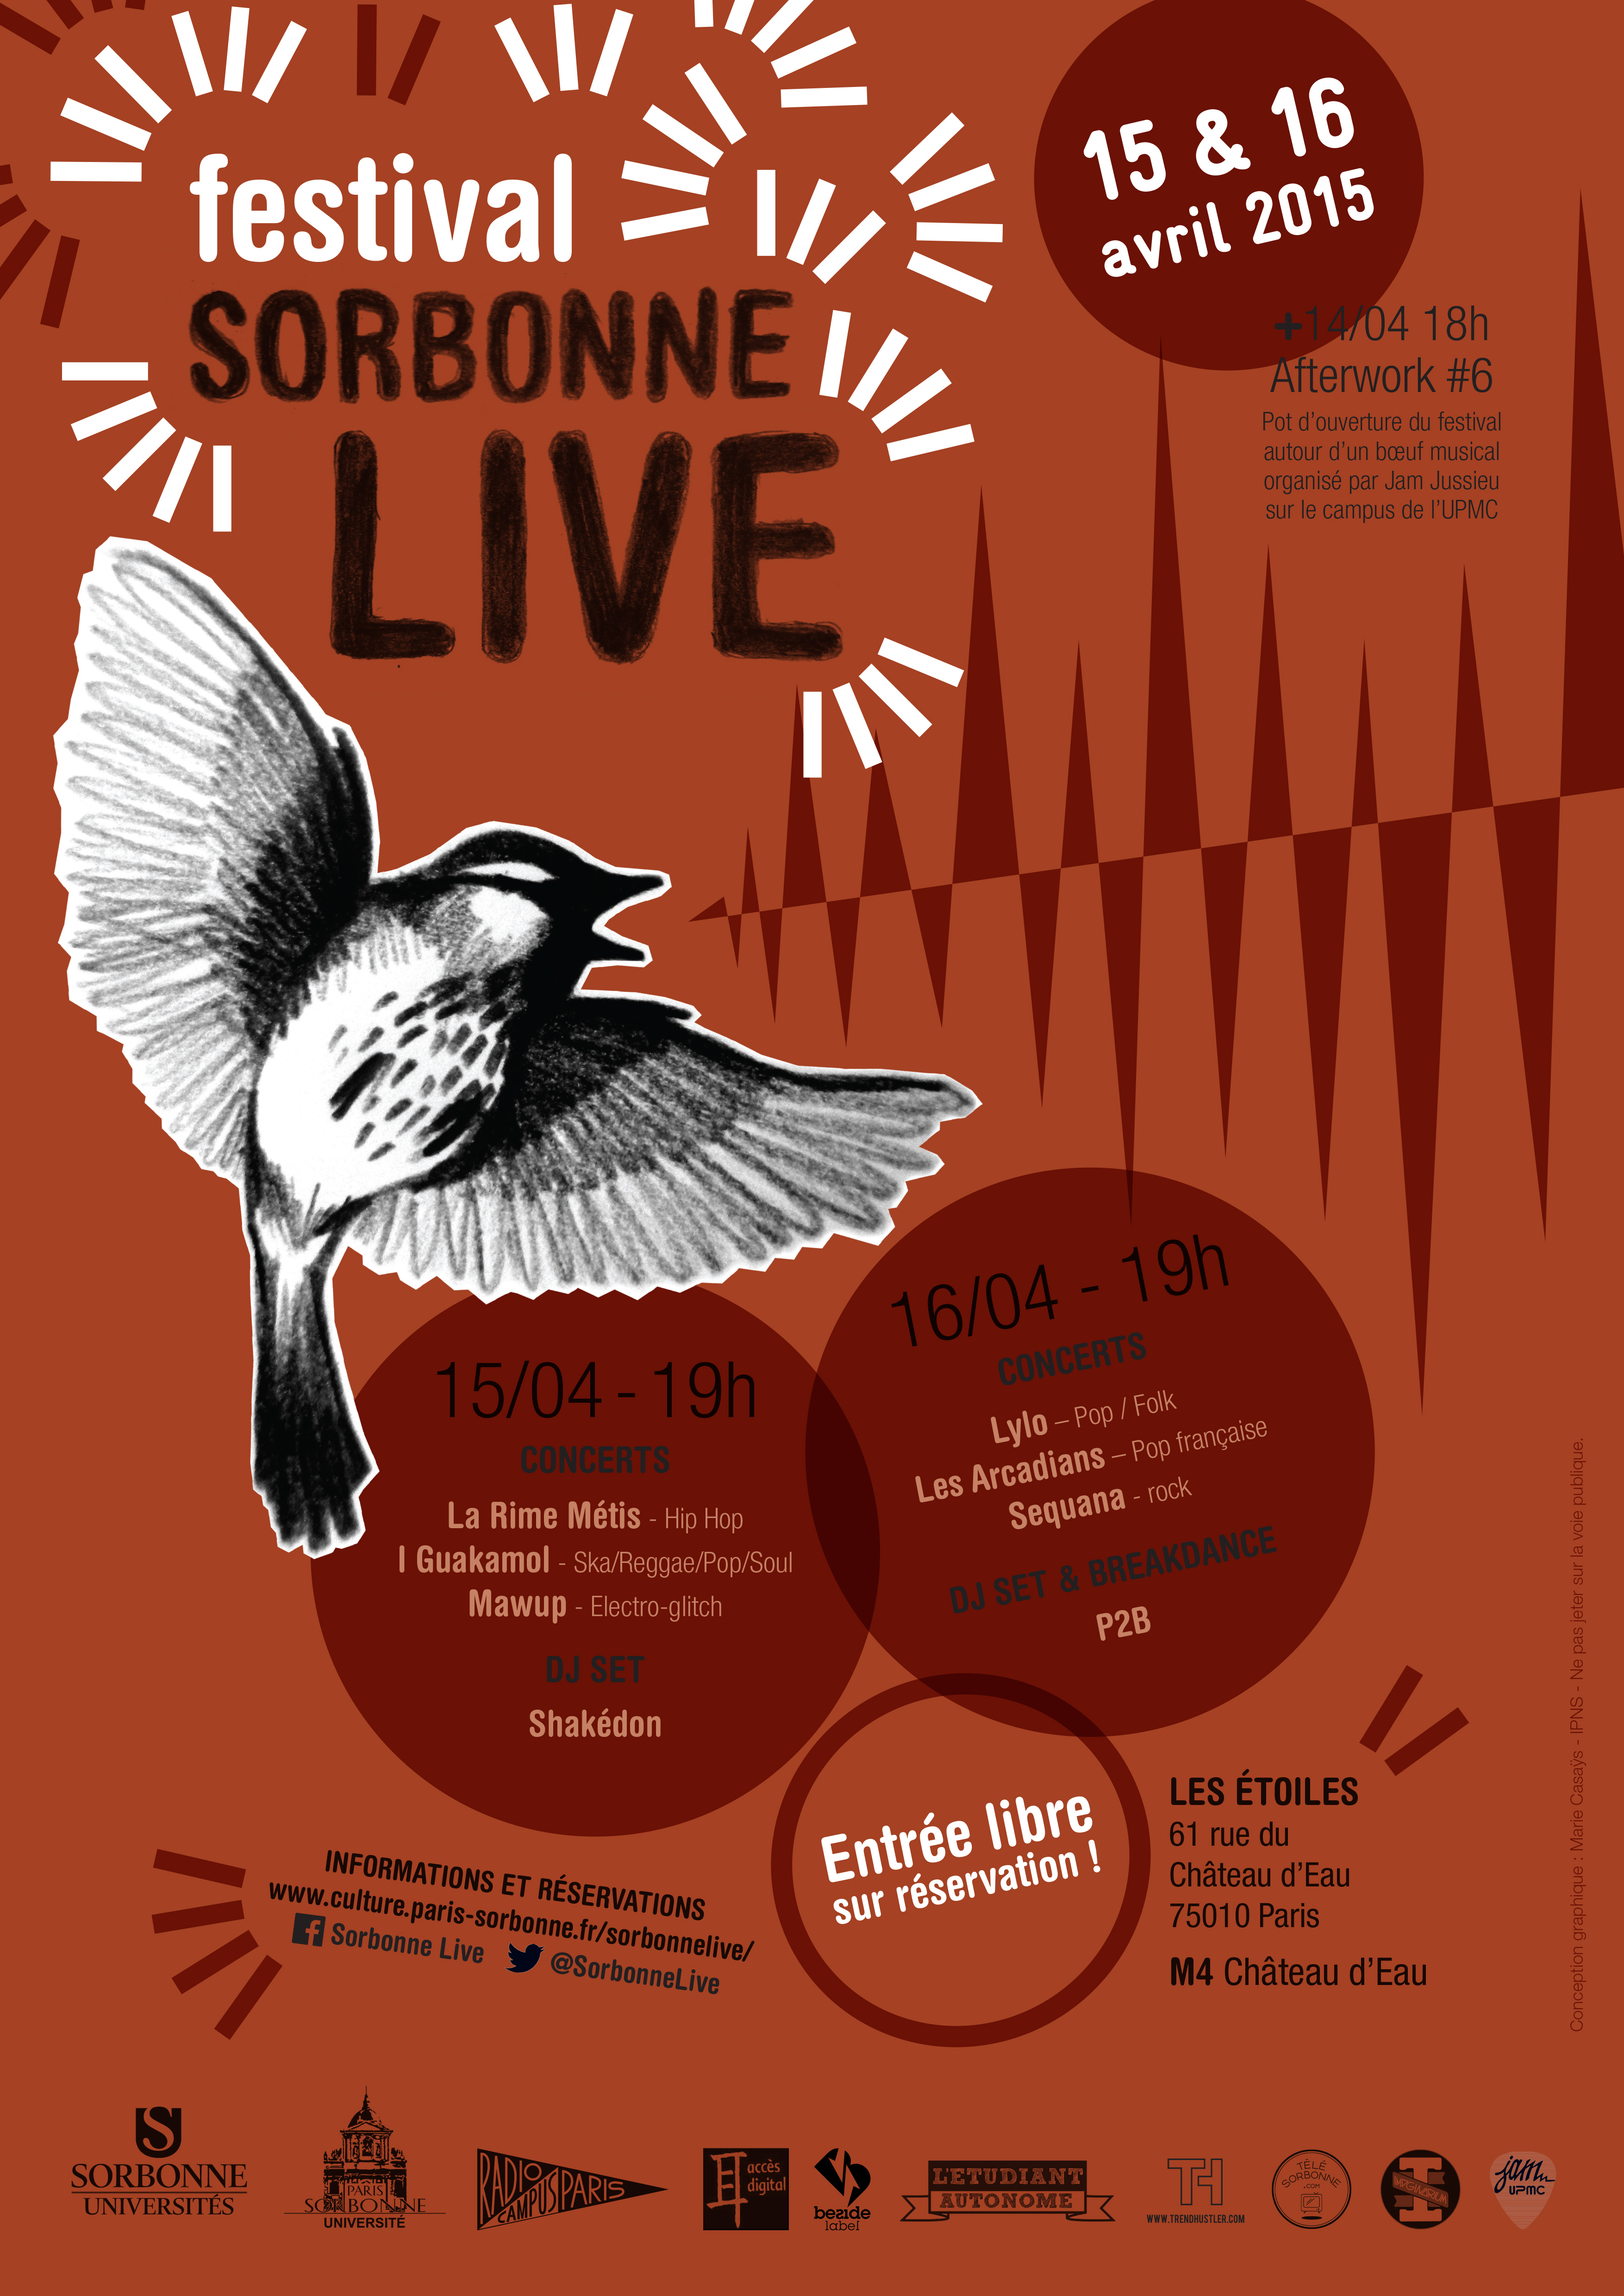 Sorbonne Live Affiche festival